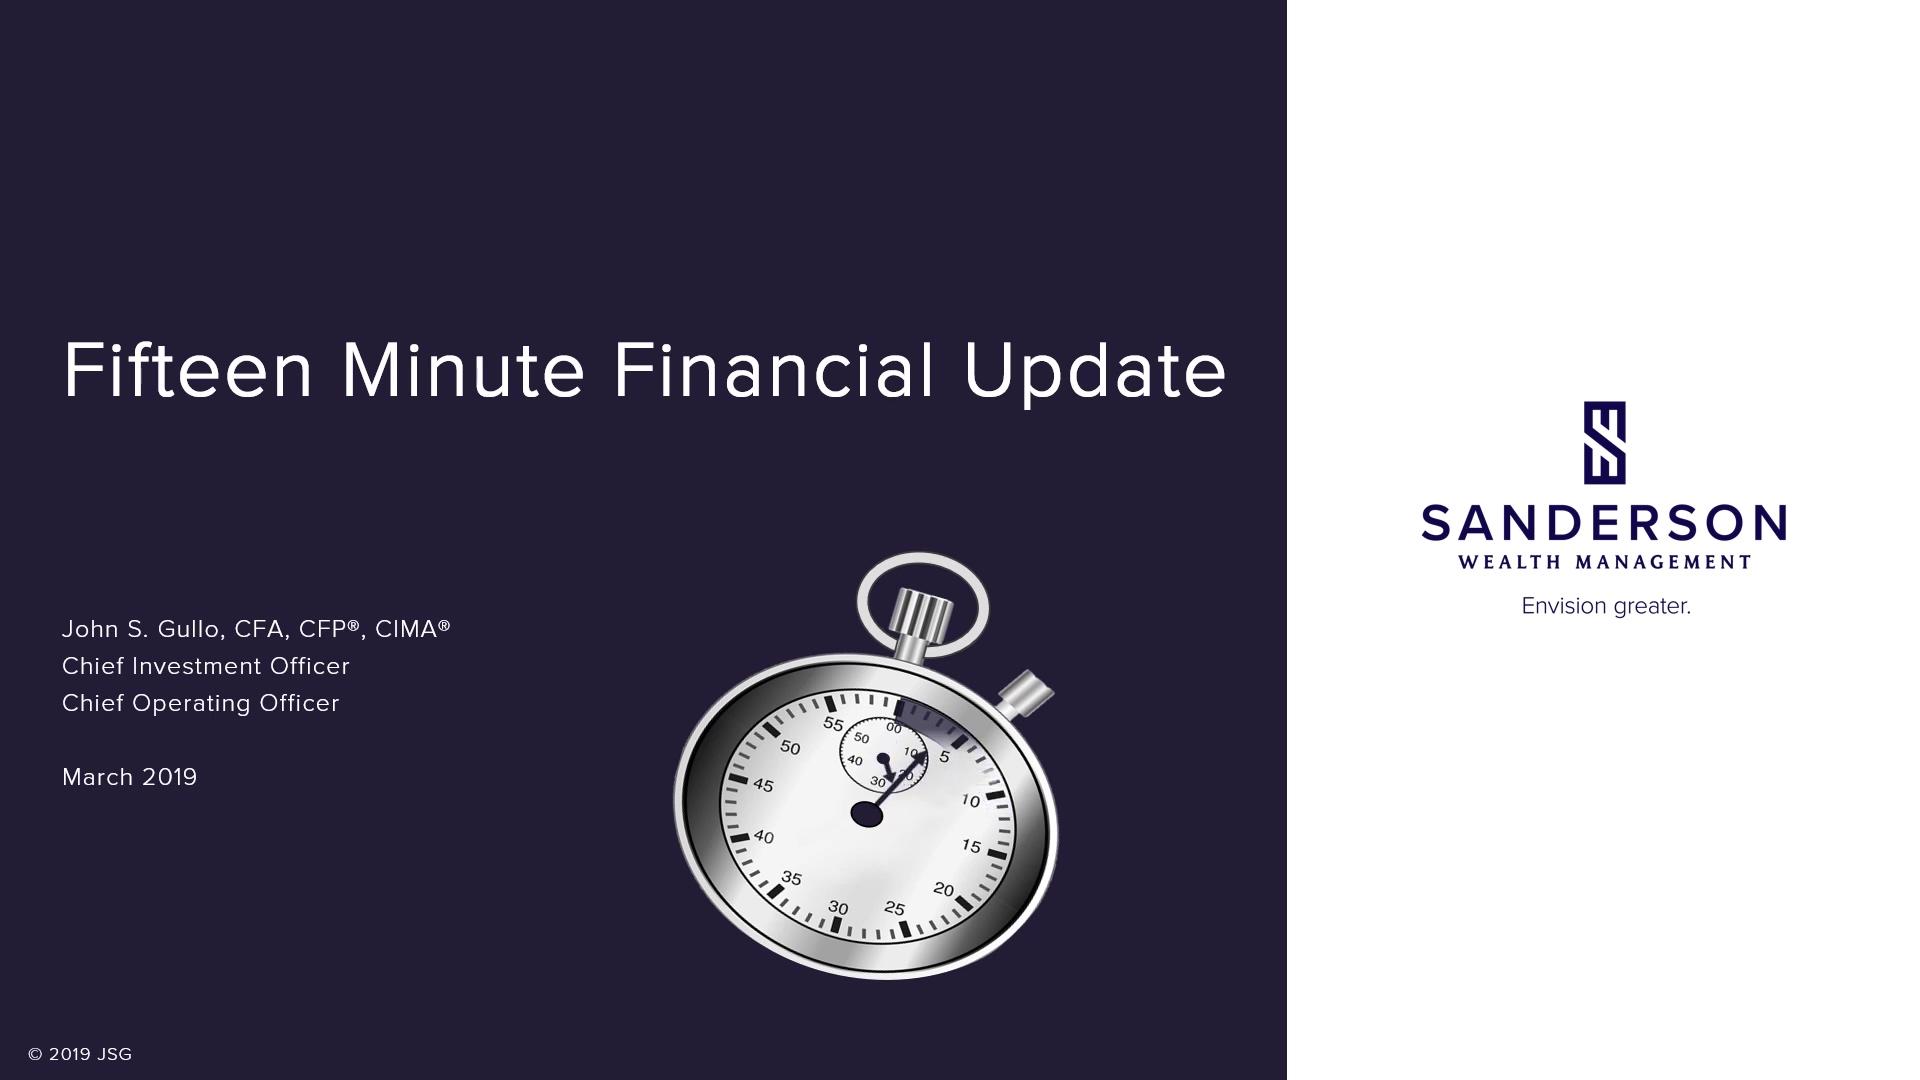 2019-Q1 First Quarter 2019 Investment Update